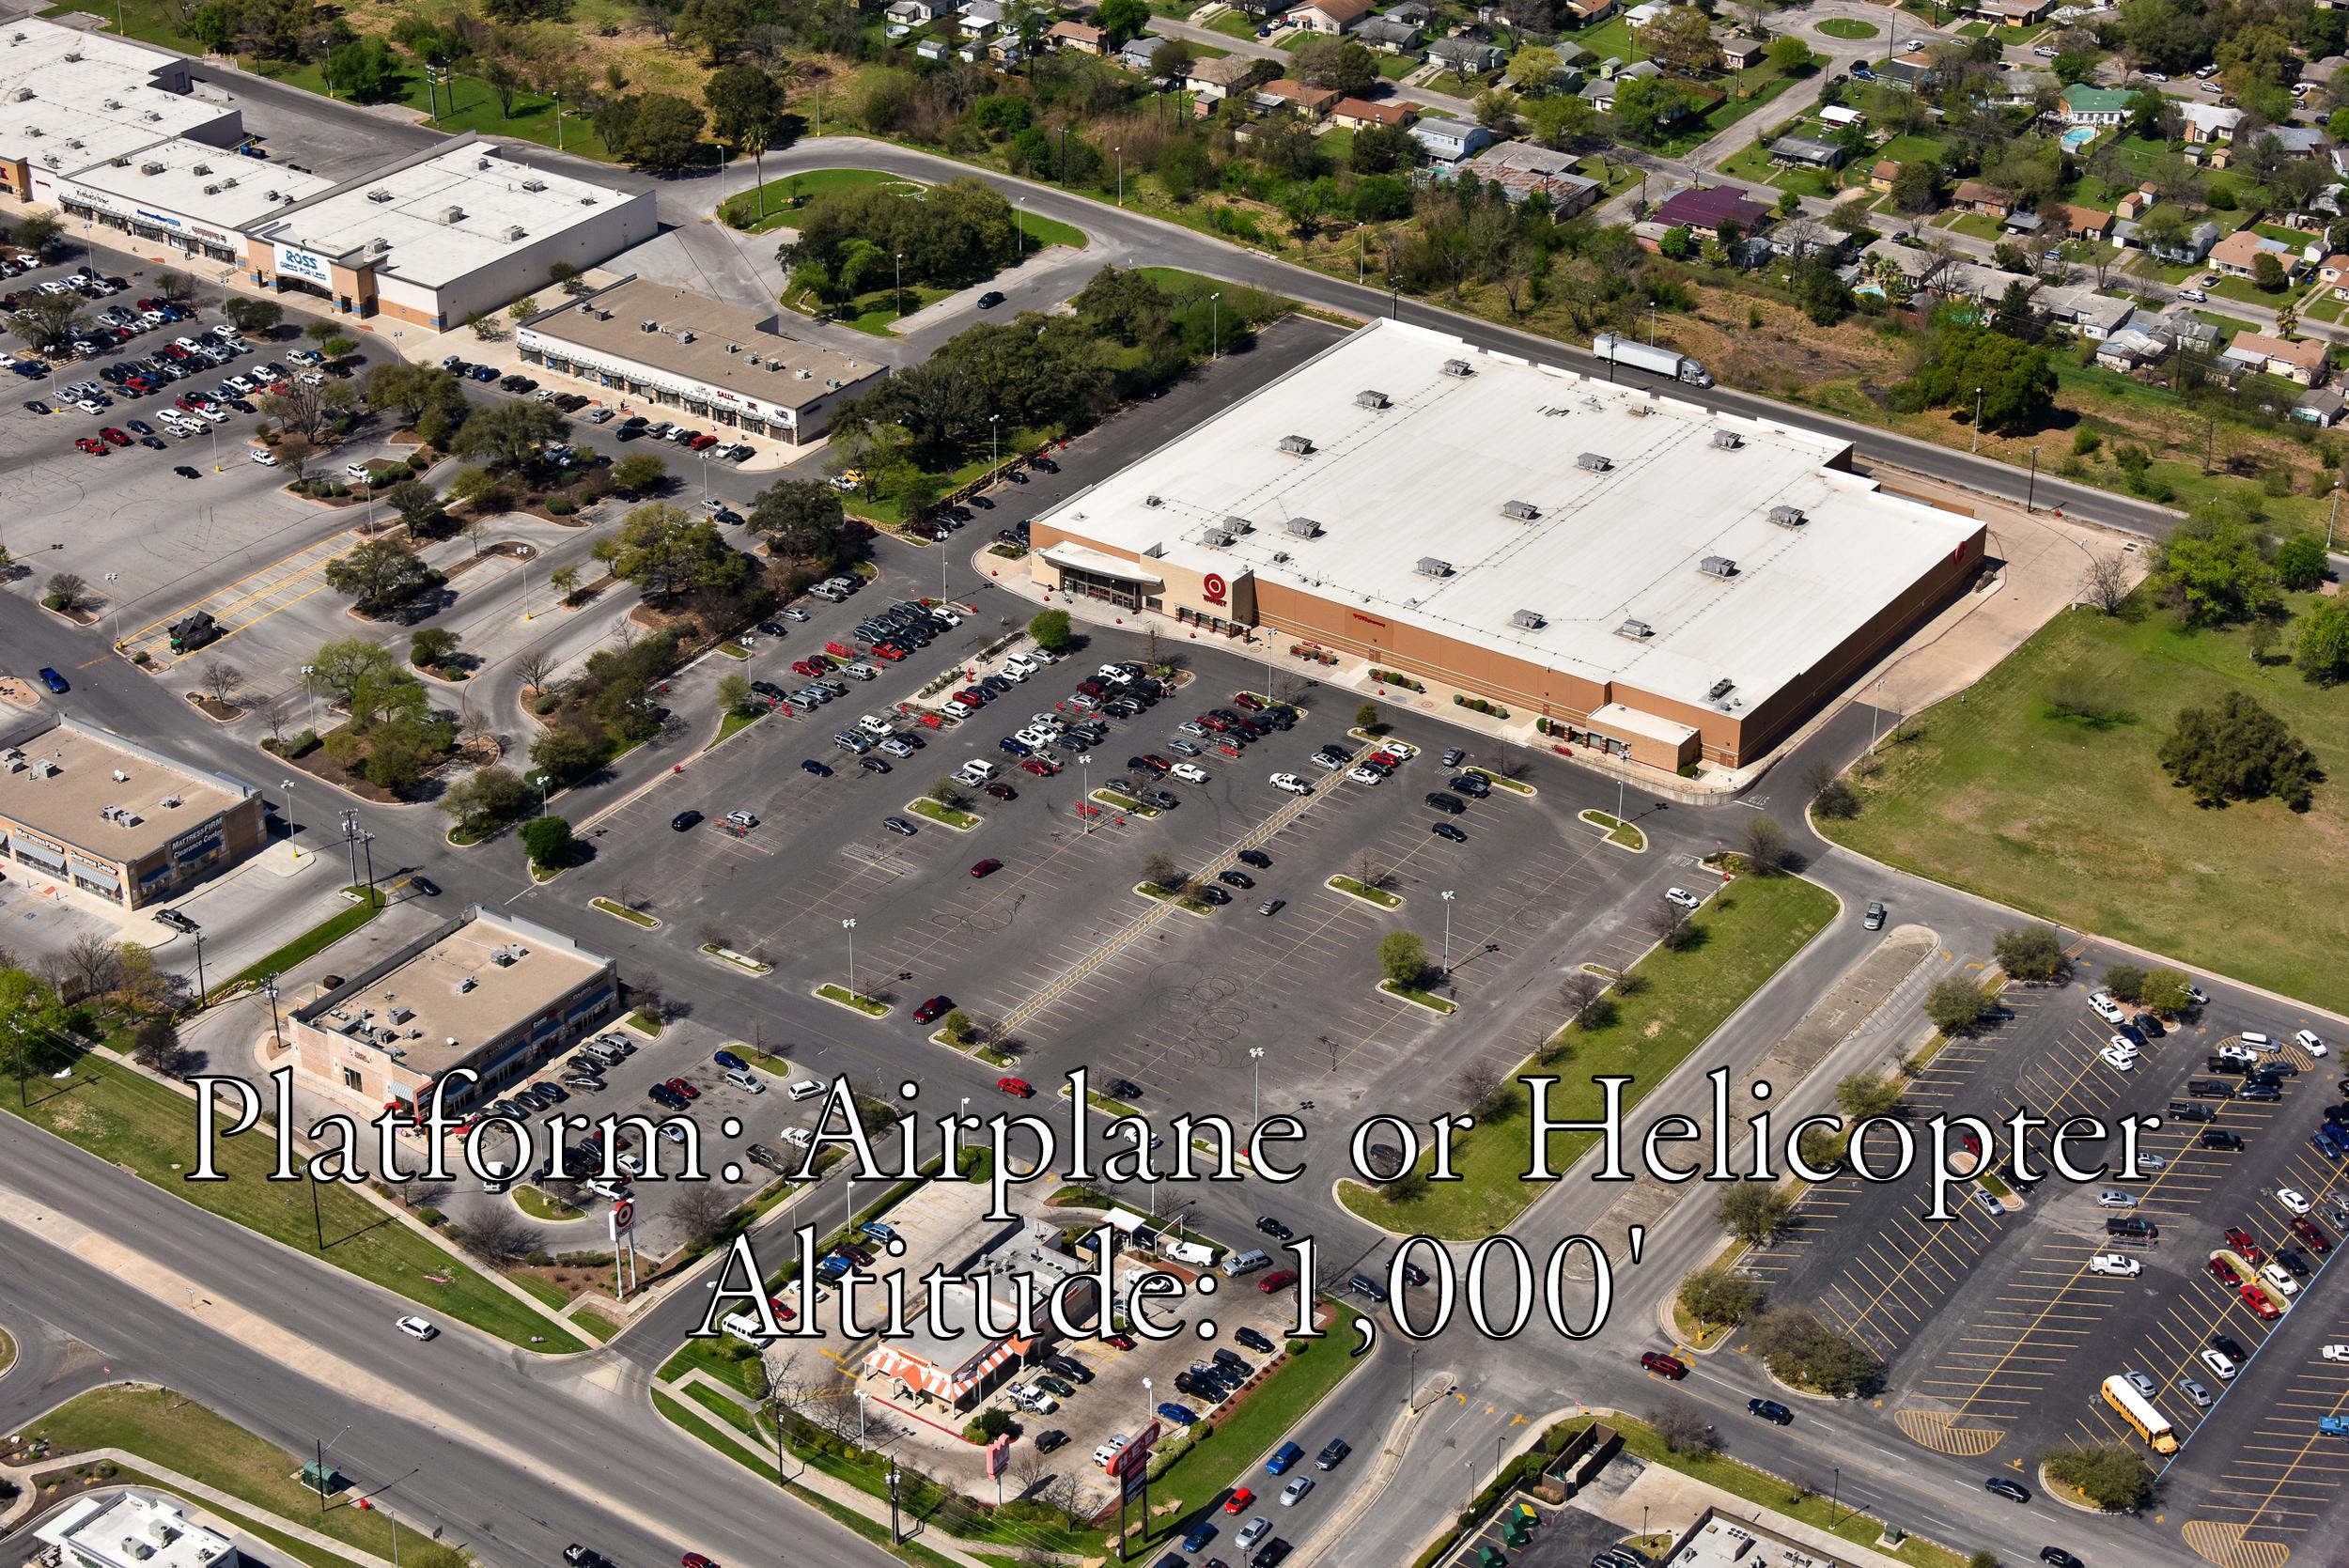 san-antonio-texas-aerial-photographer-drone-photo-image-tx-airplane-1000